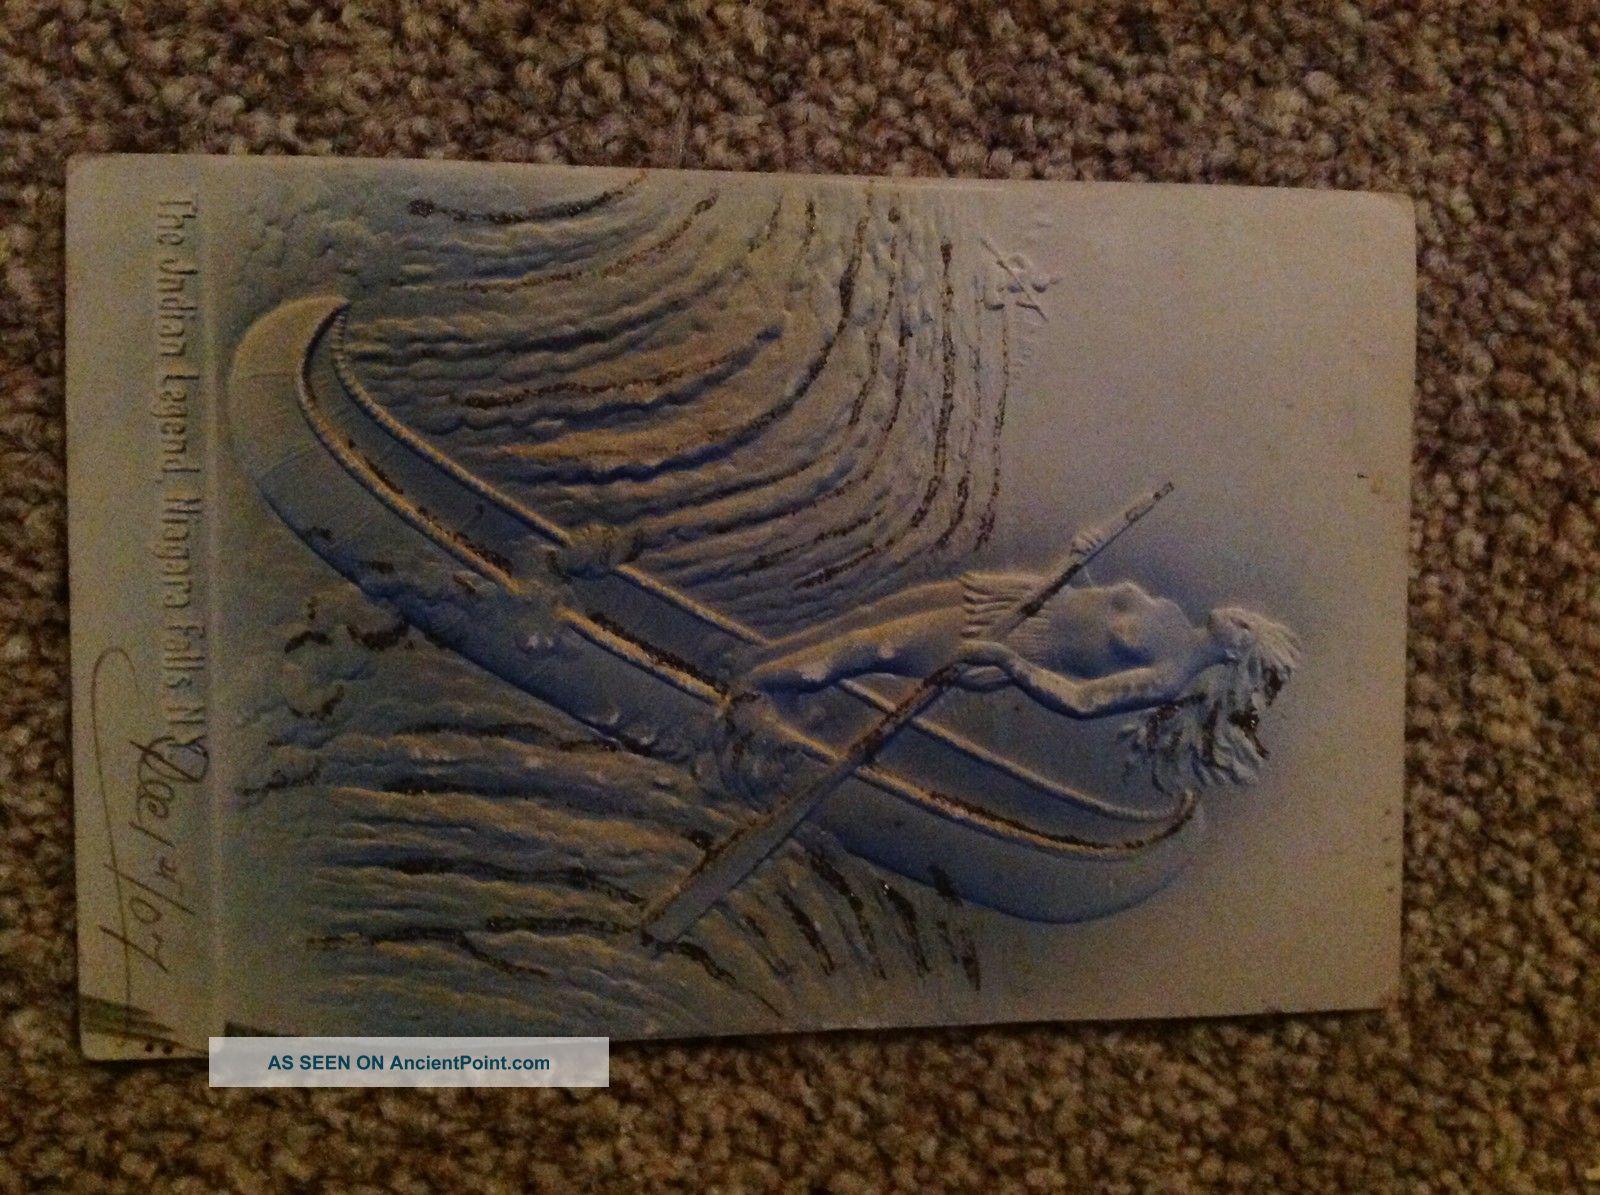 Antique Native American Postcard,  The Indian Legend,  Niagara Falls,  1907. Native American photo